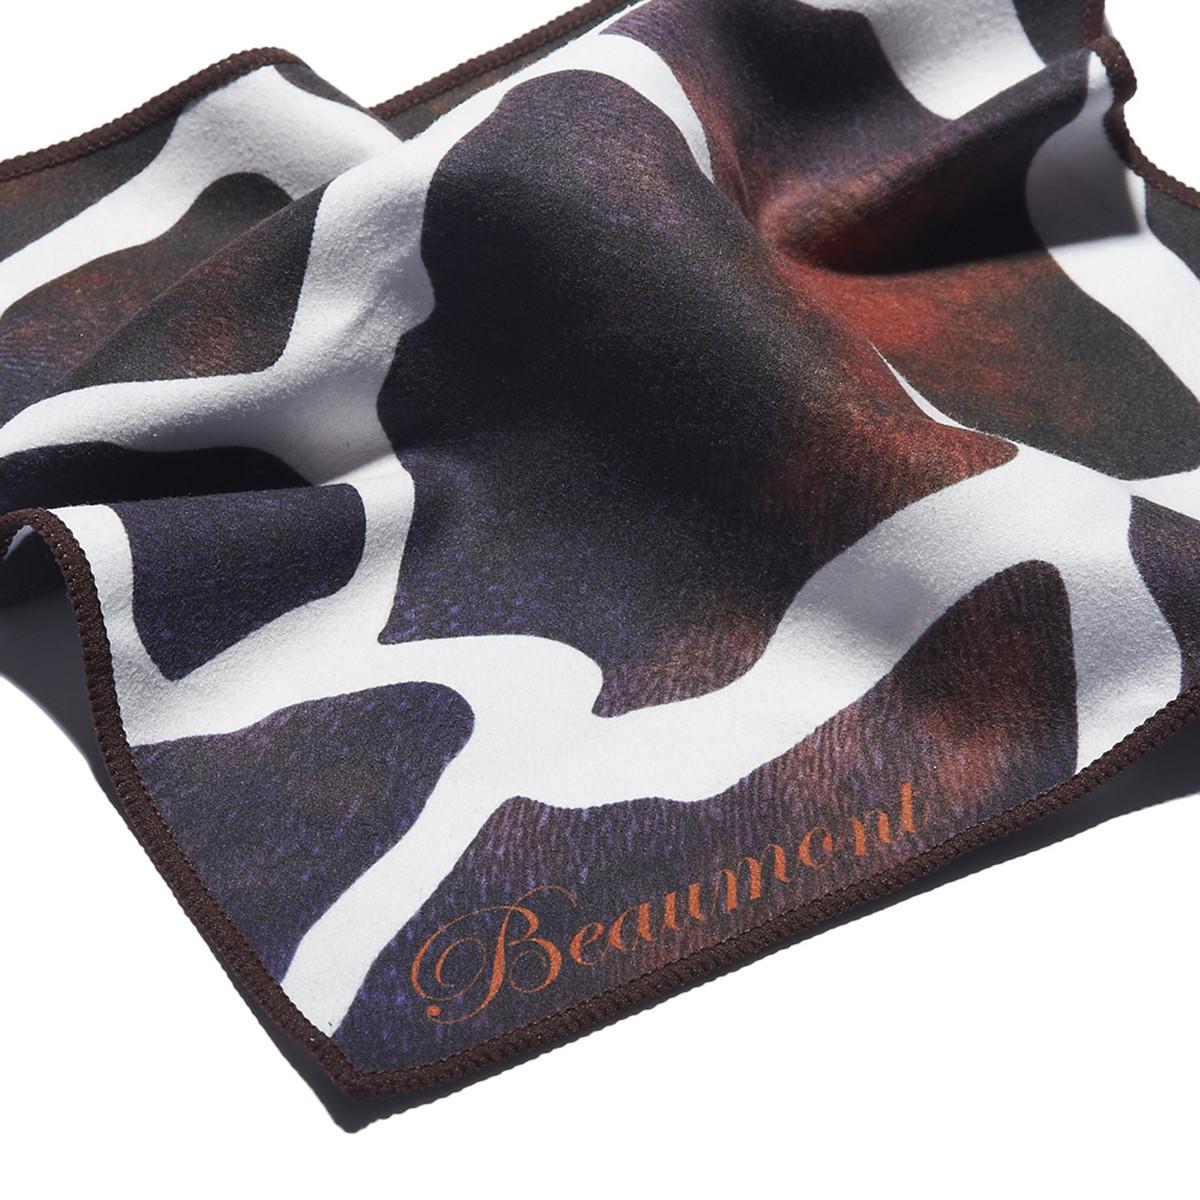 Microfiber Cloth Jb Hi Fi: Beaumont Giraffe Cleaning Cloth At Gear4music